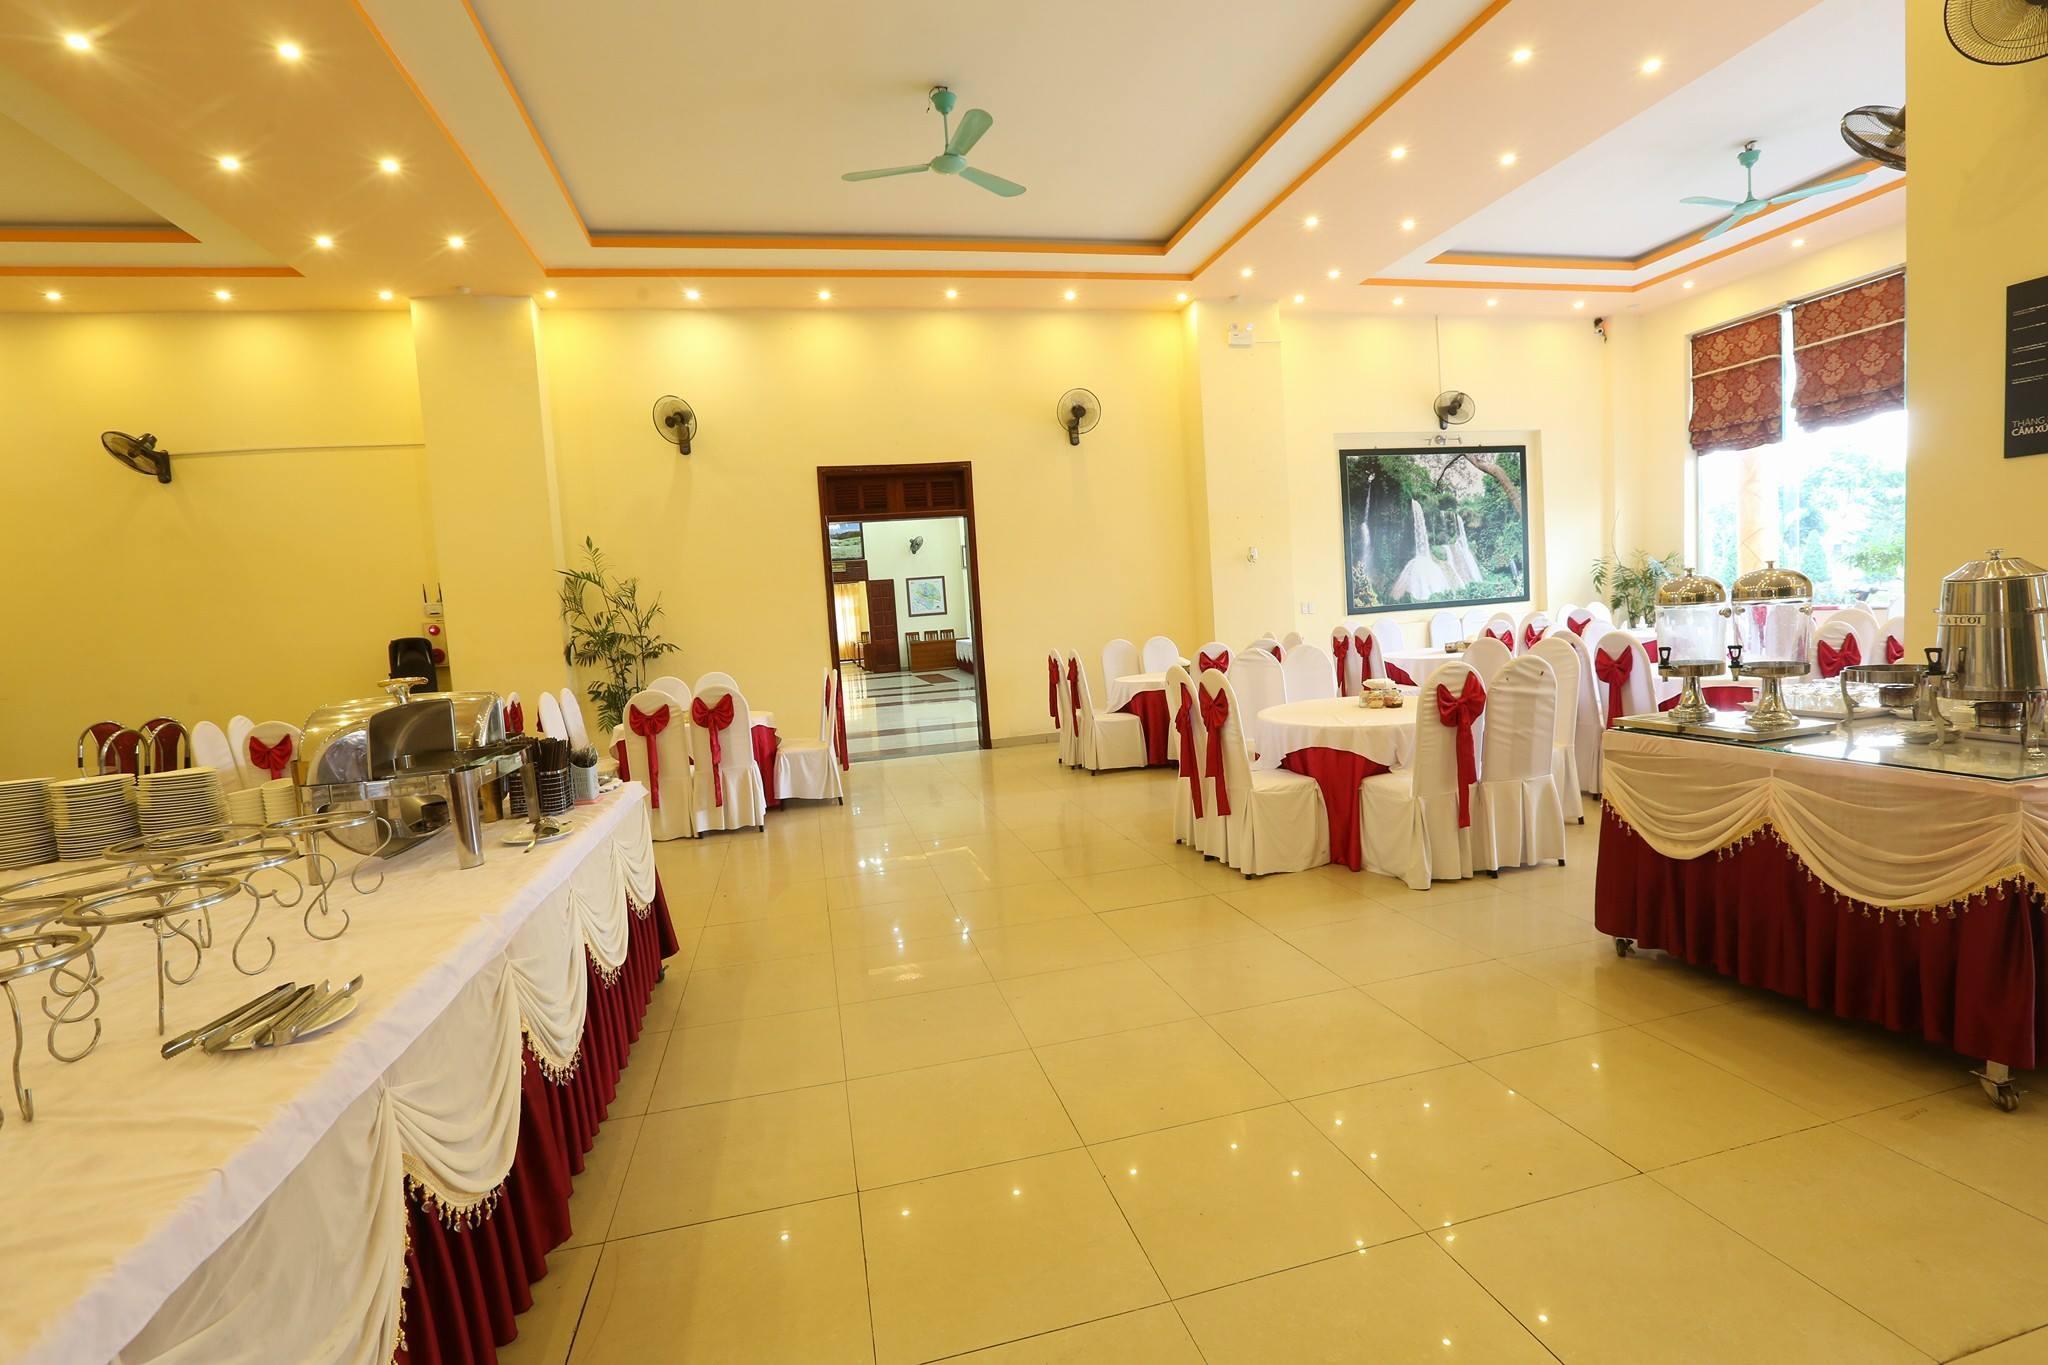 Sao Xanh Moc Chau Hotel